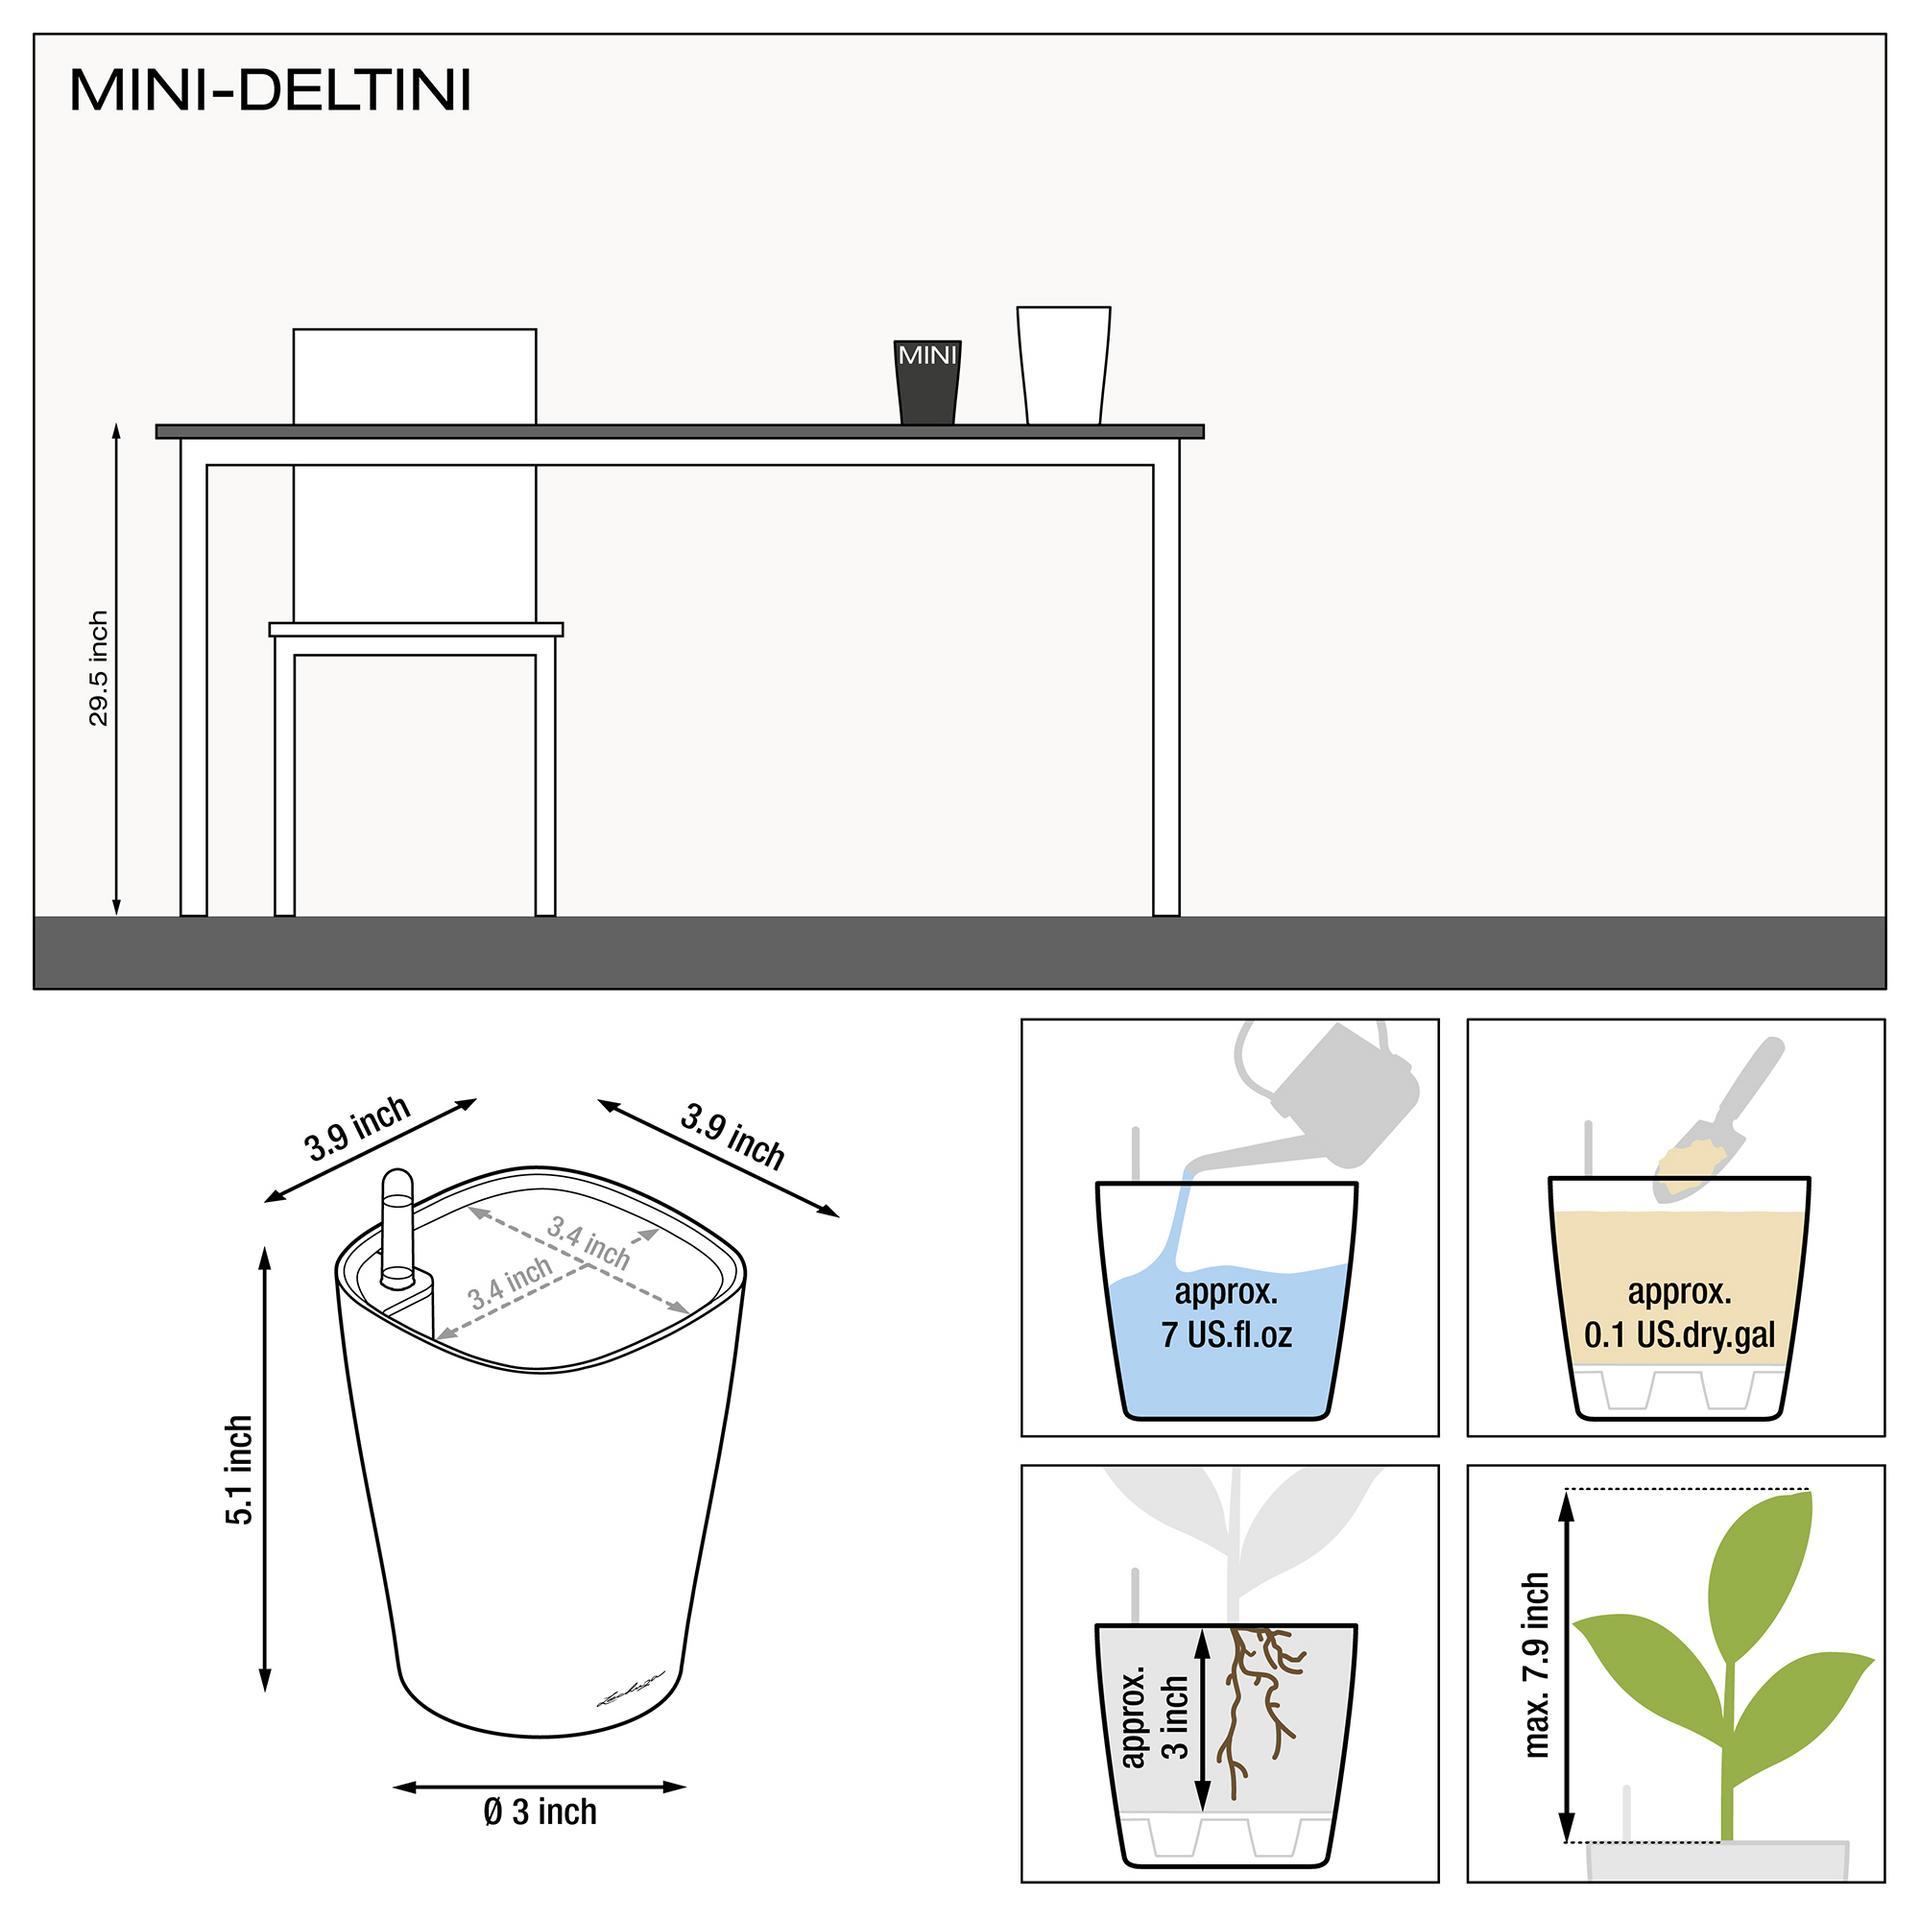 le_deltini-10_product_addi_nz_us